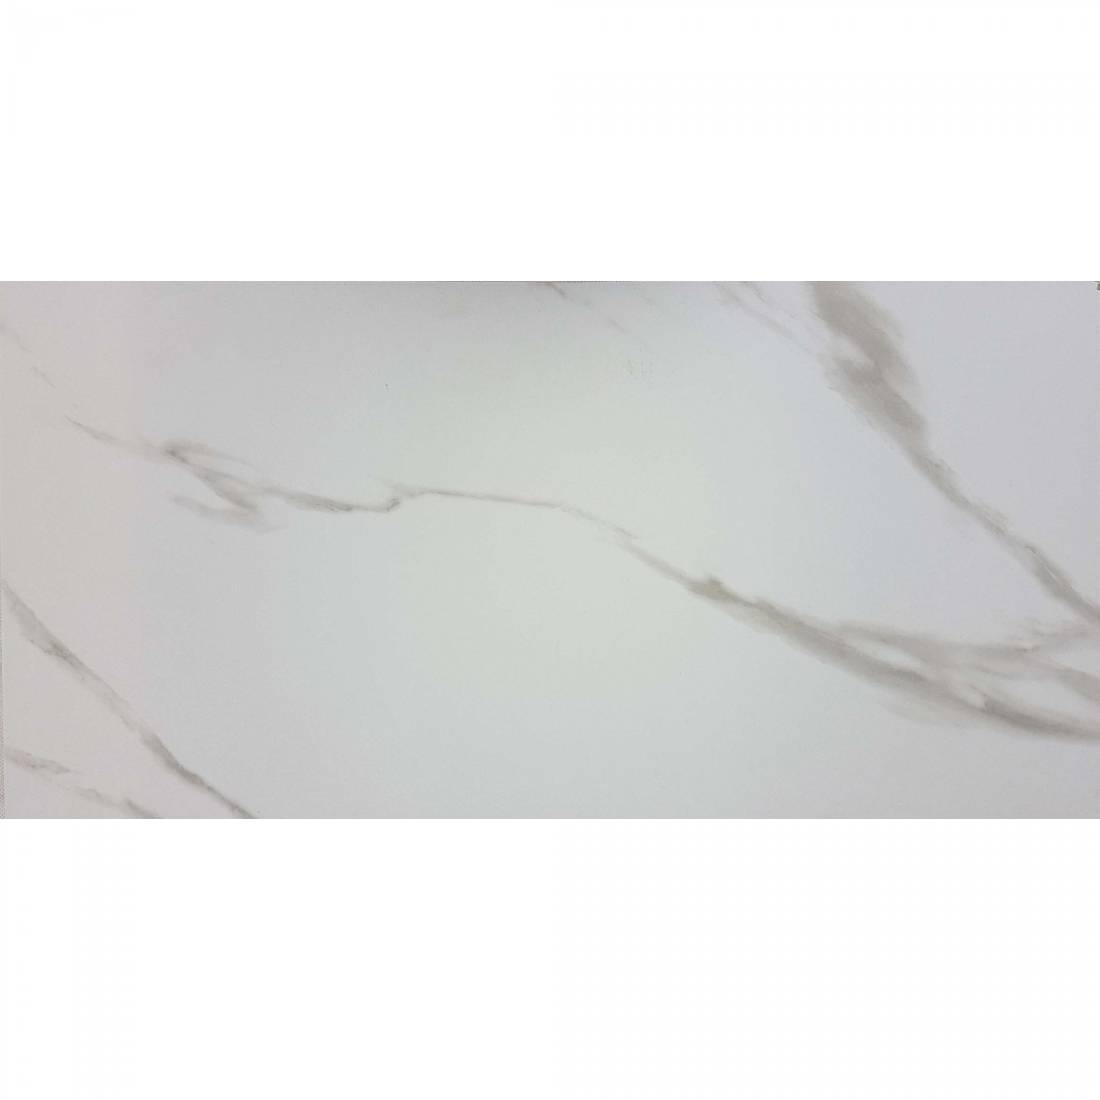 Matt Carrara 30x60 White Matt 1